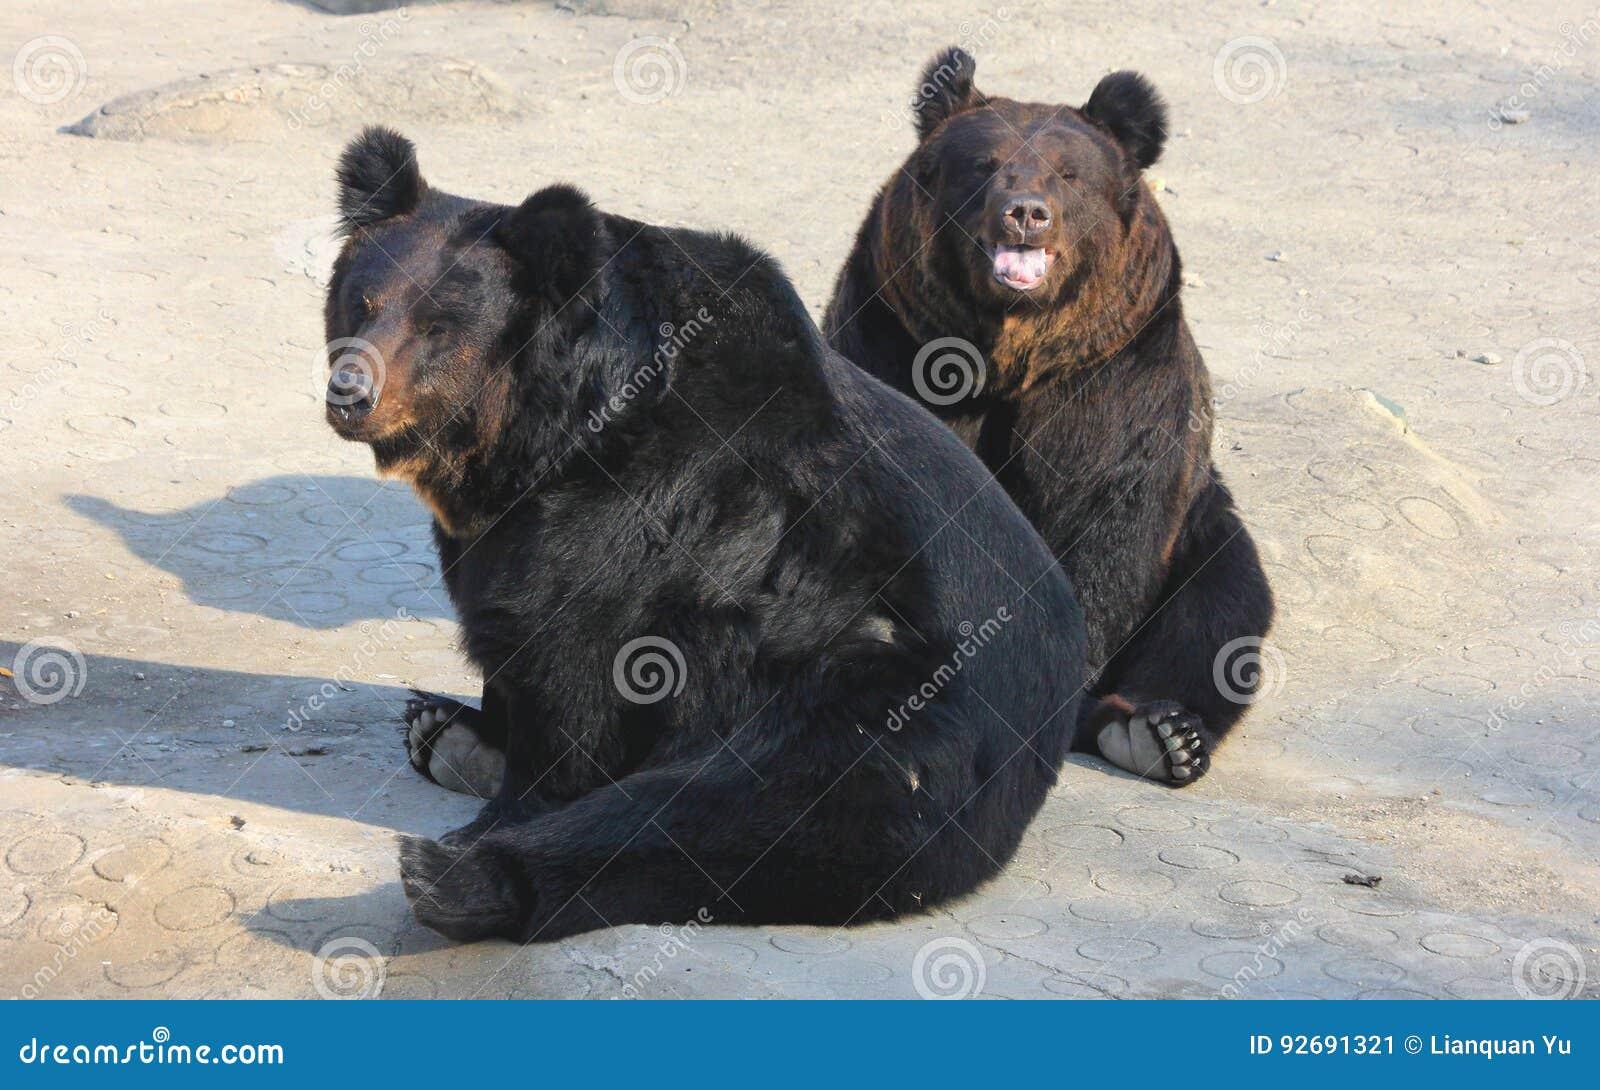 Hairy black bears